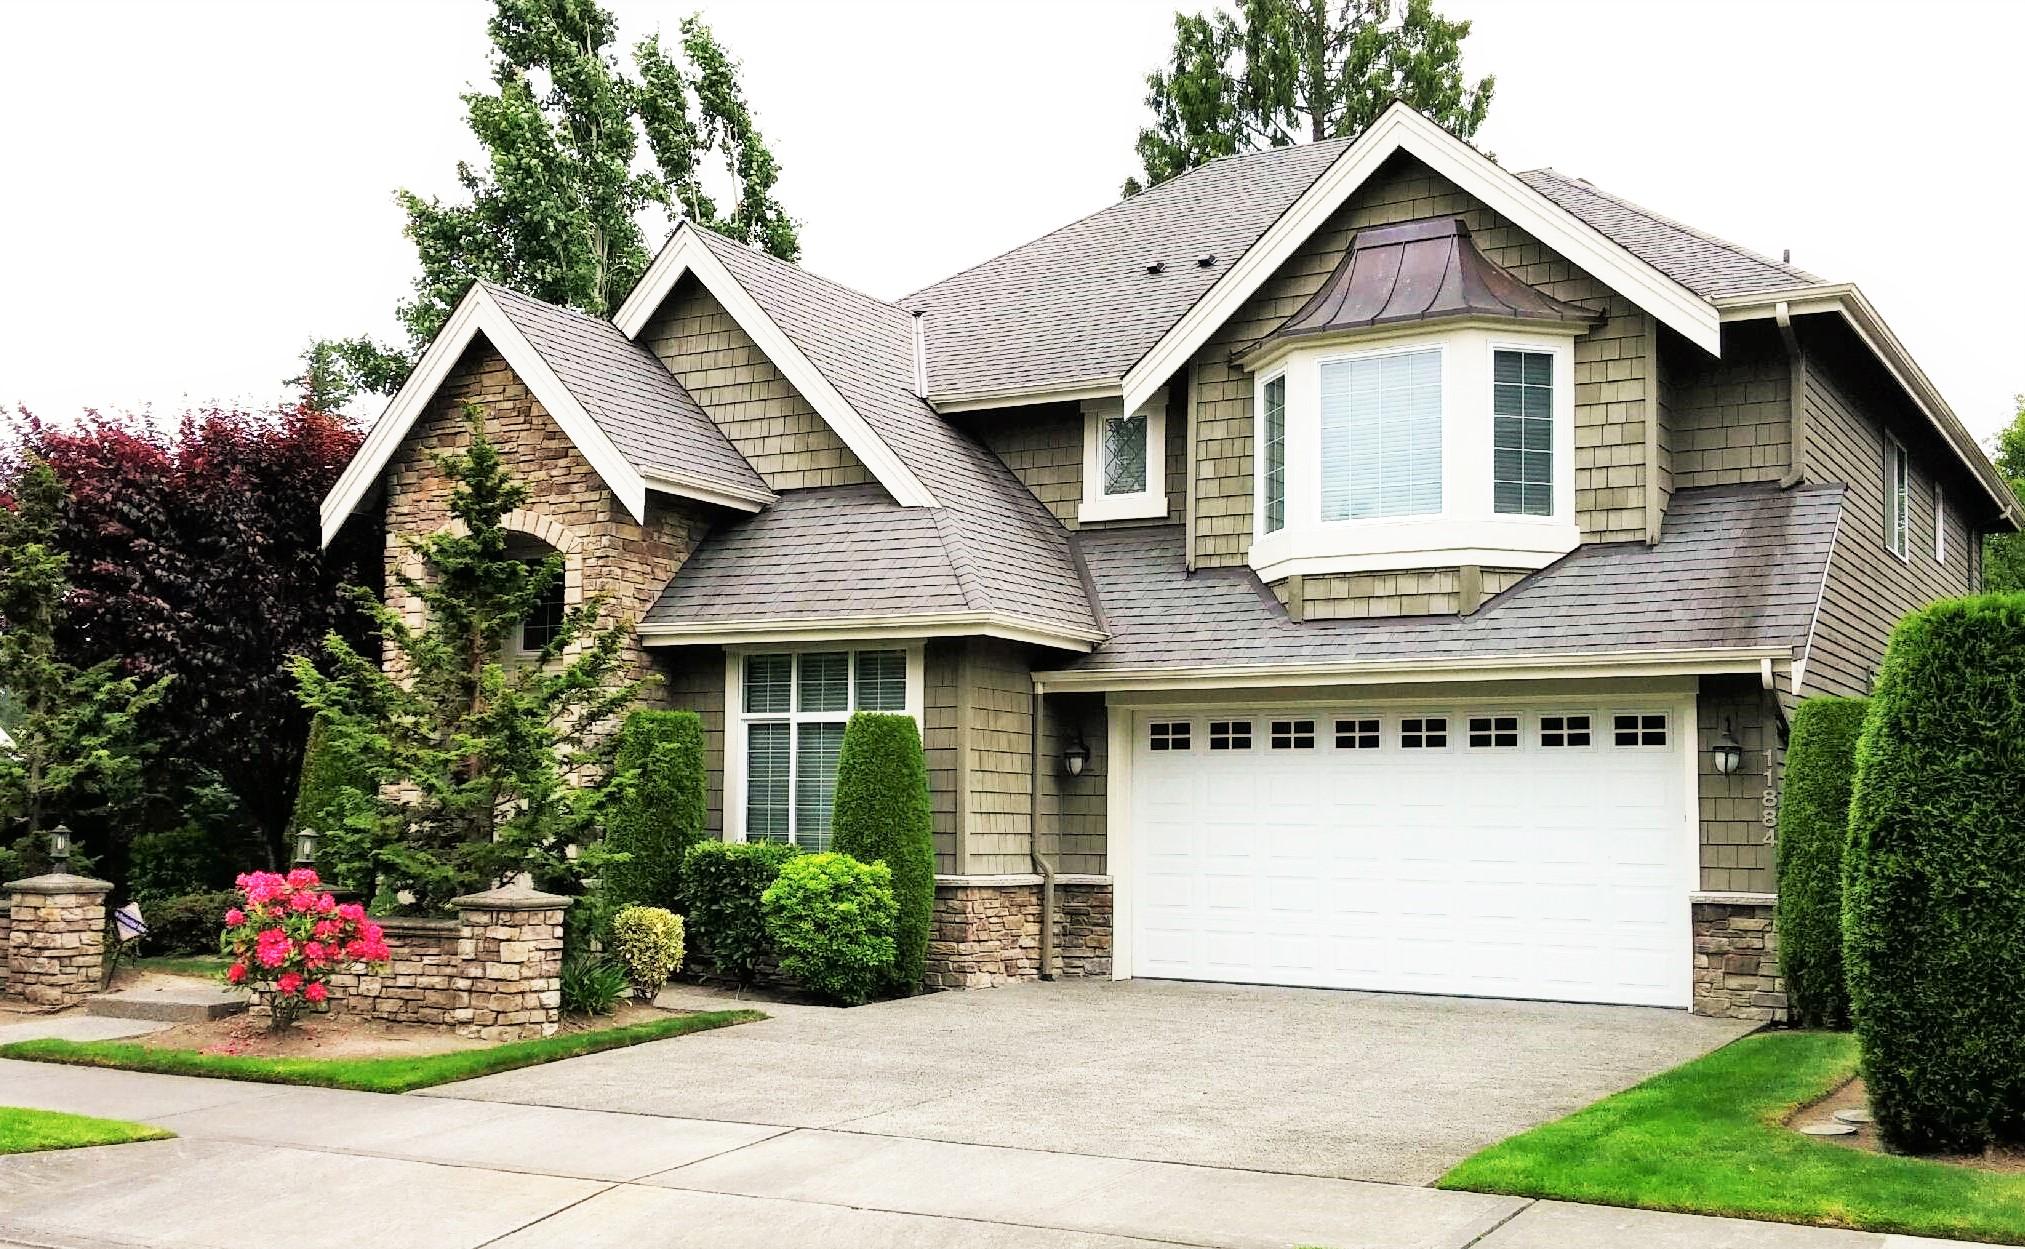 Home Owner Insurance Policy in Auburn, WA